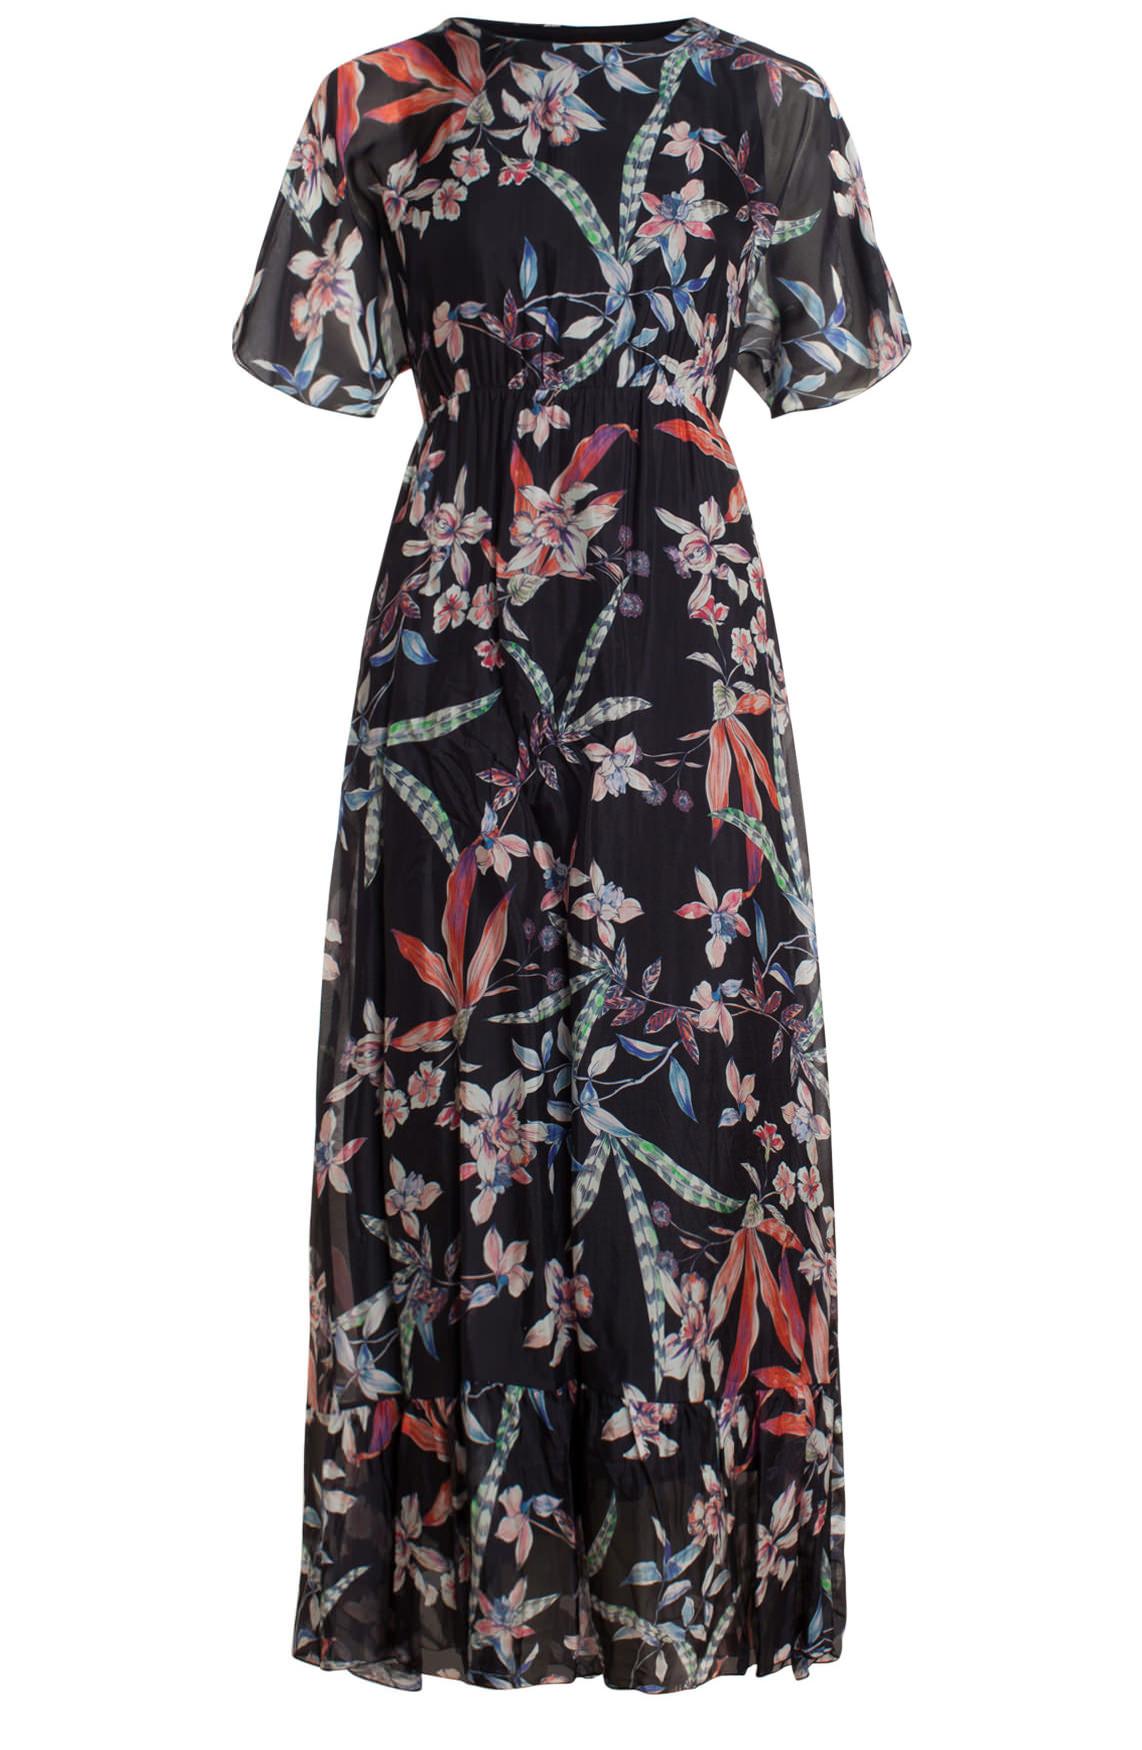 La Fée Maraboutée Dames Maxi jurk met bloemenprint zwart